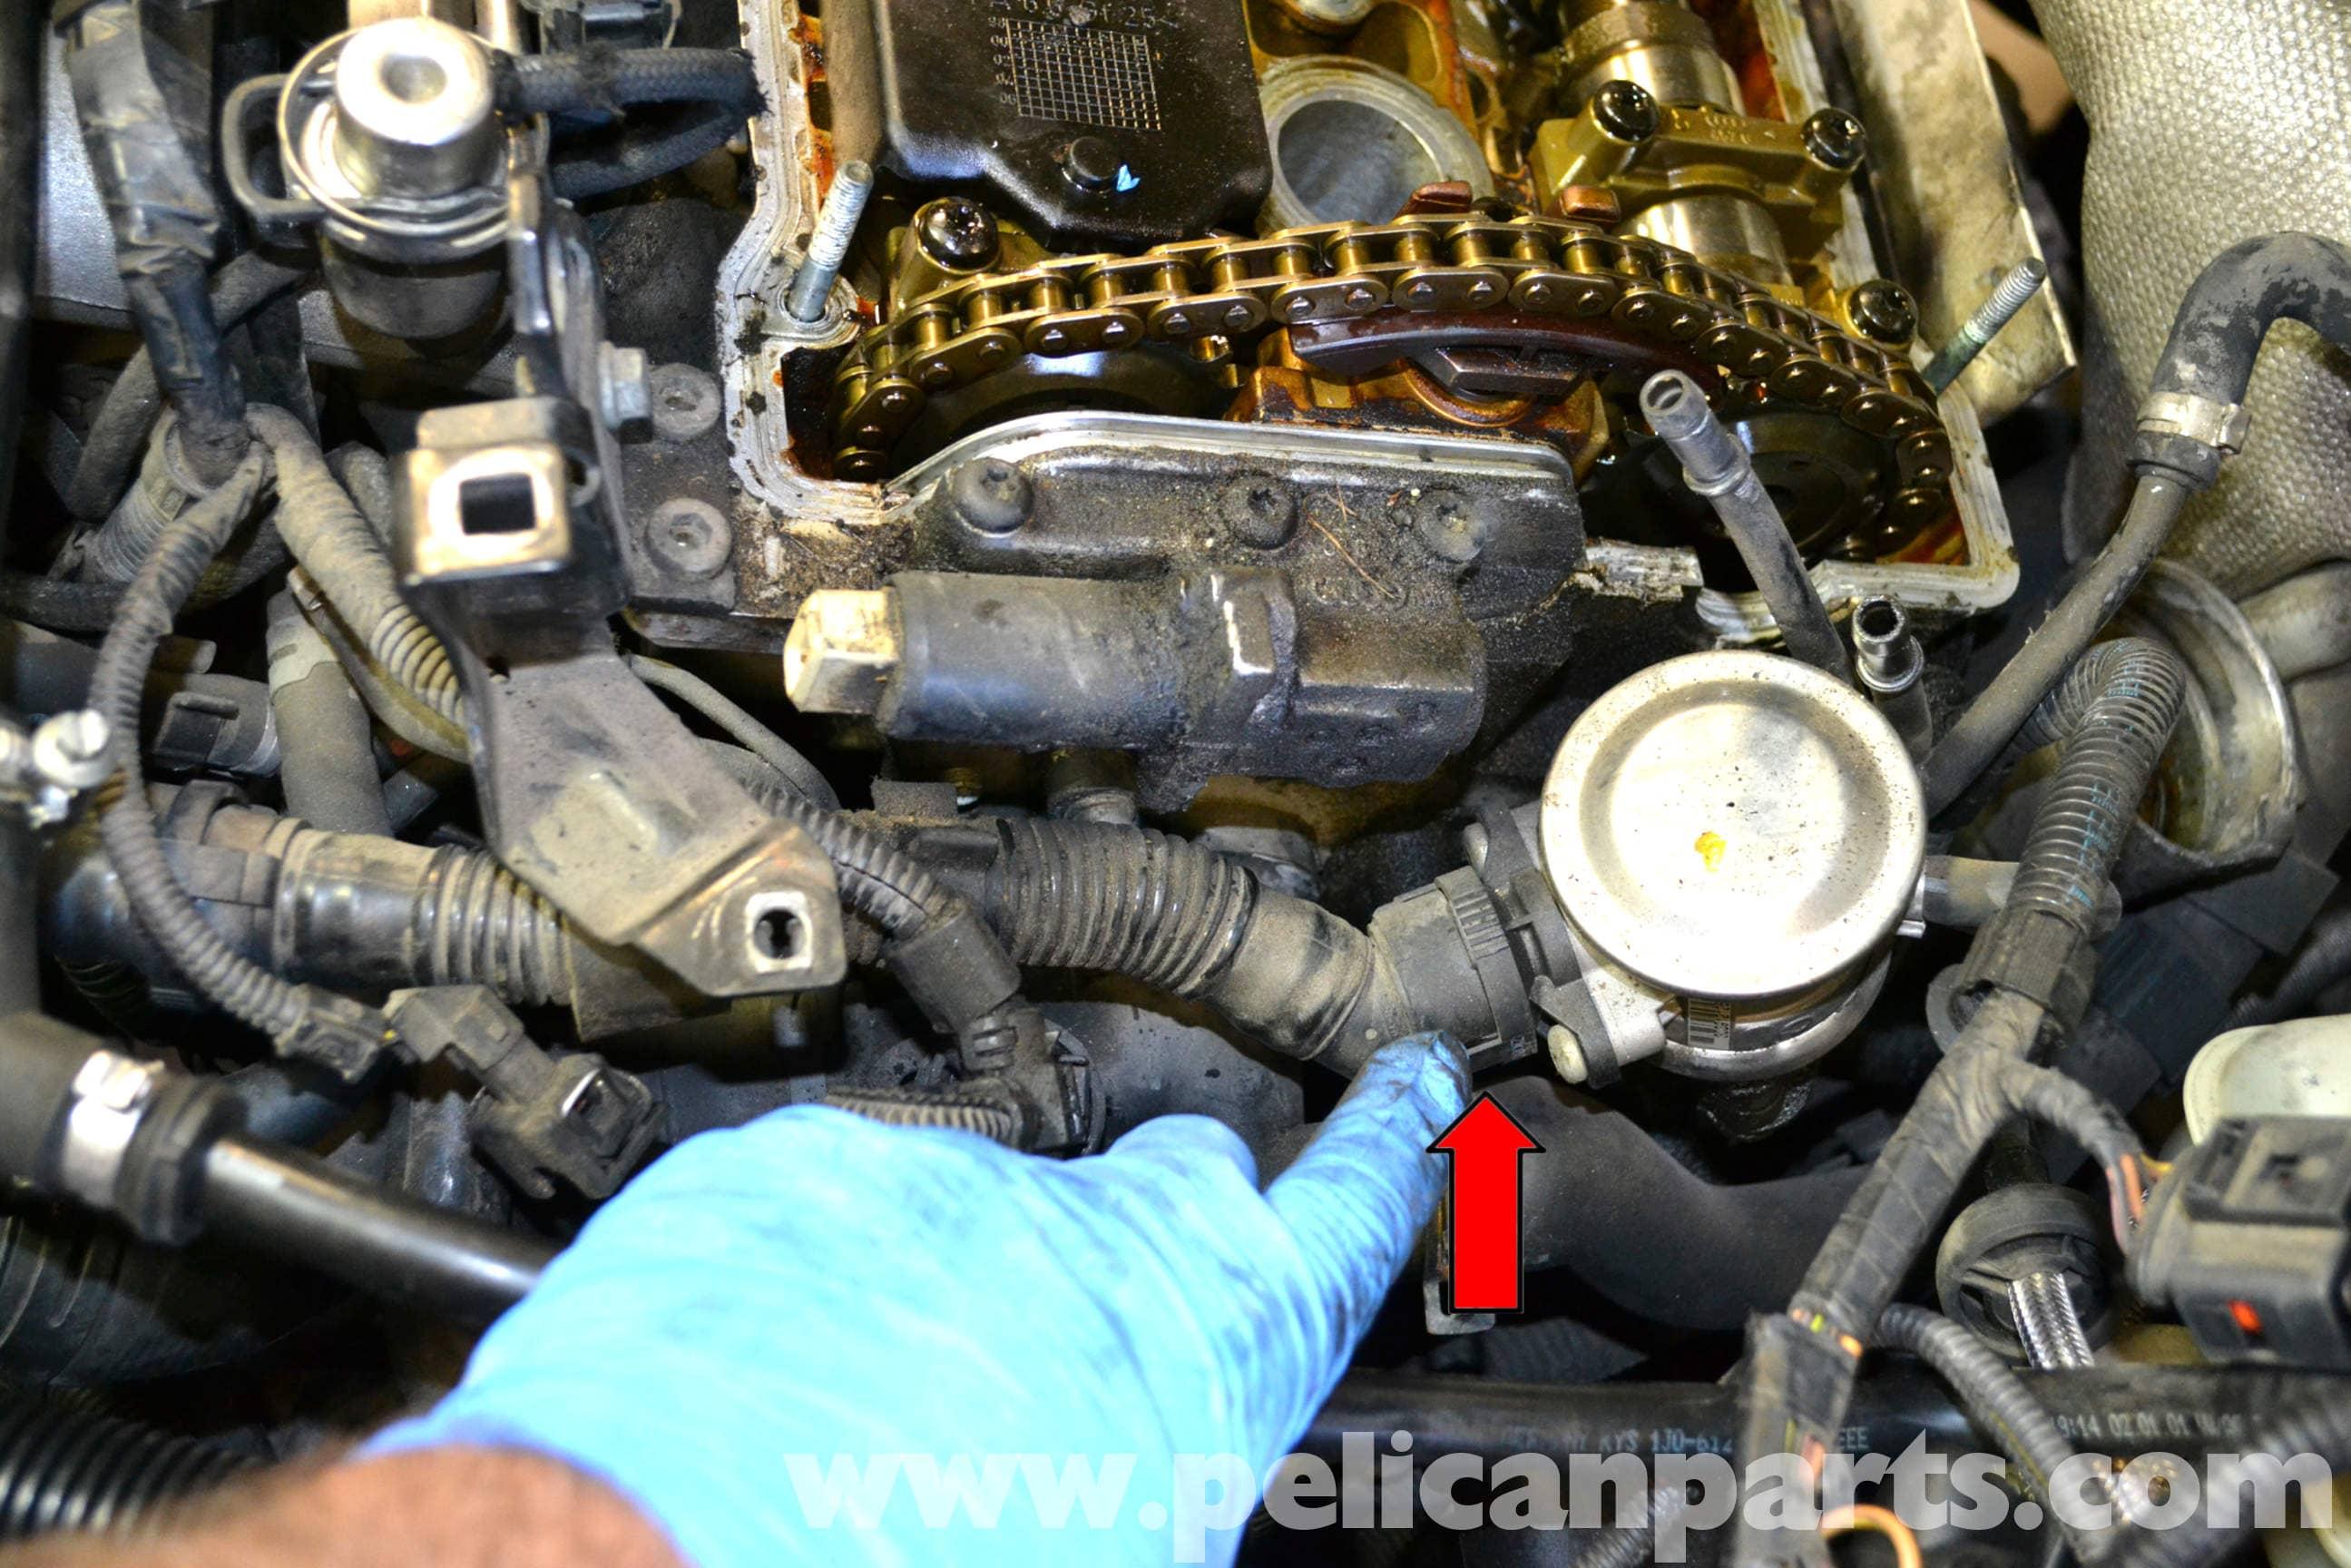 Volkswagen Golf GTI Mk IV Head Gasket Replacement (1999-2005) - Pelican Parts DIY Maintenance ...